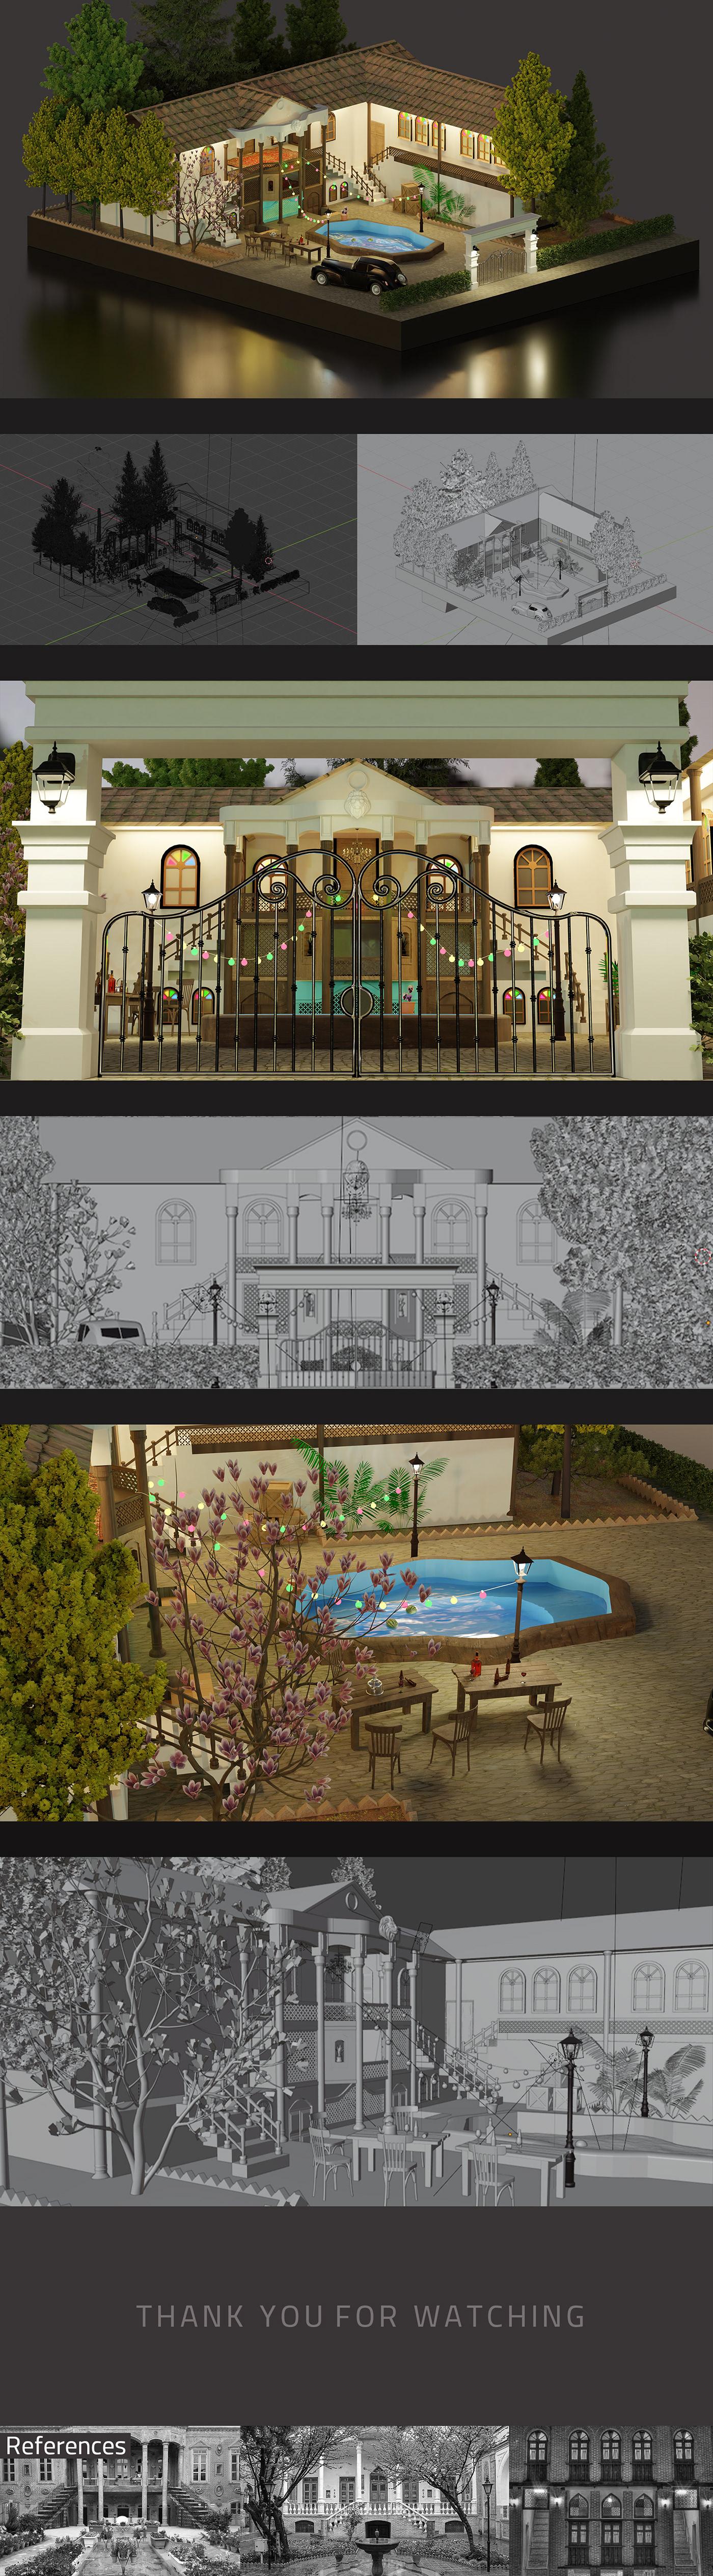 3d art,3d isometric ,3D model,armin khorsandipour,blender,Iran,Isometric,Tehran